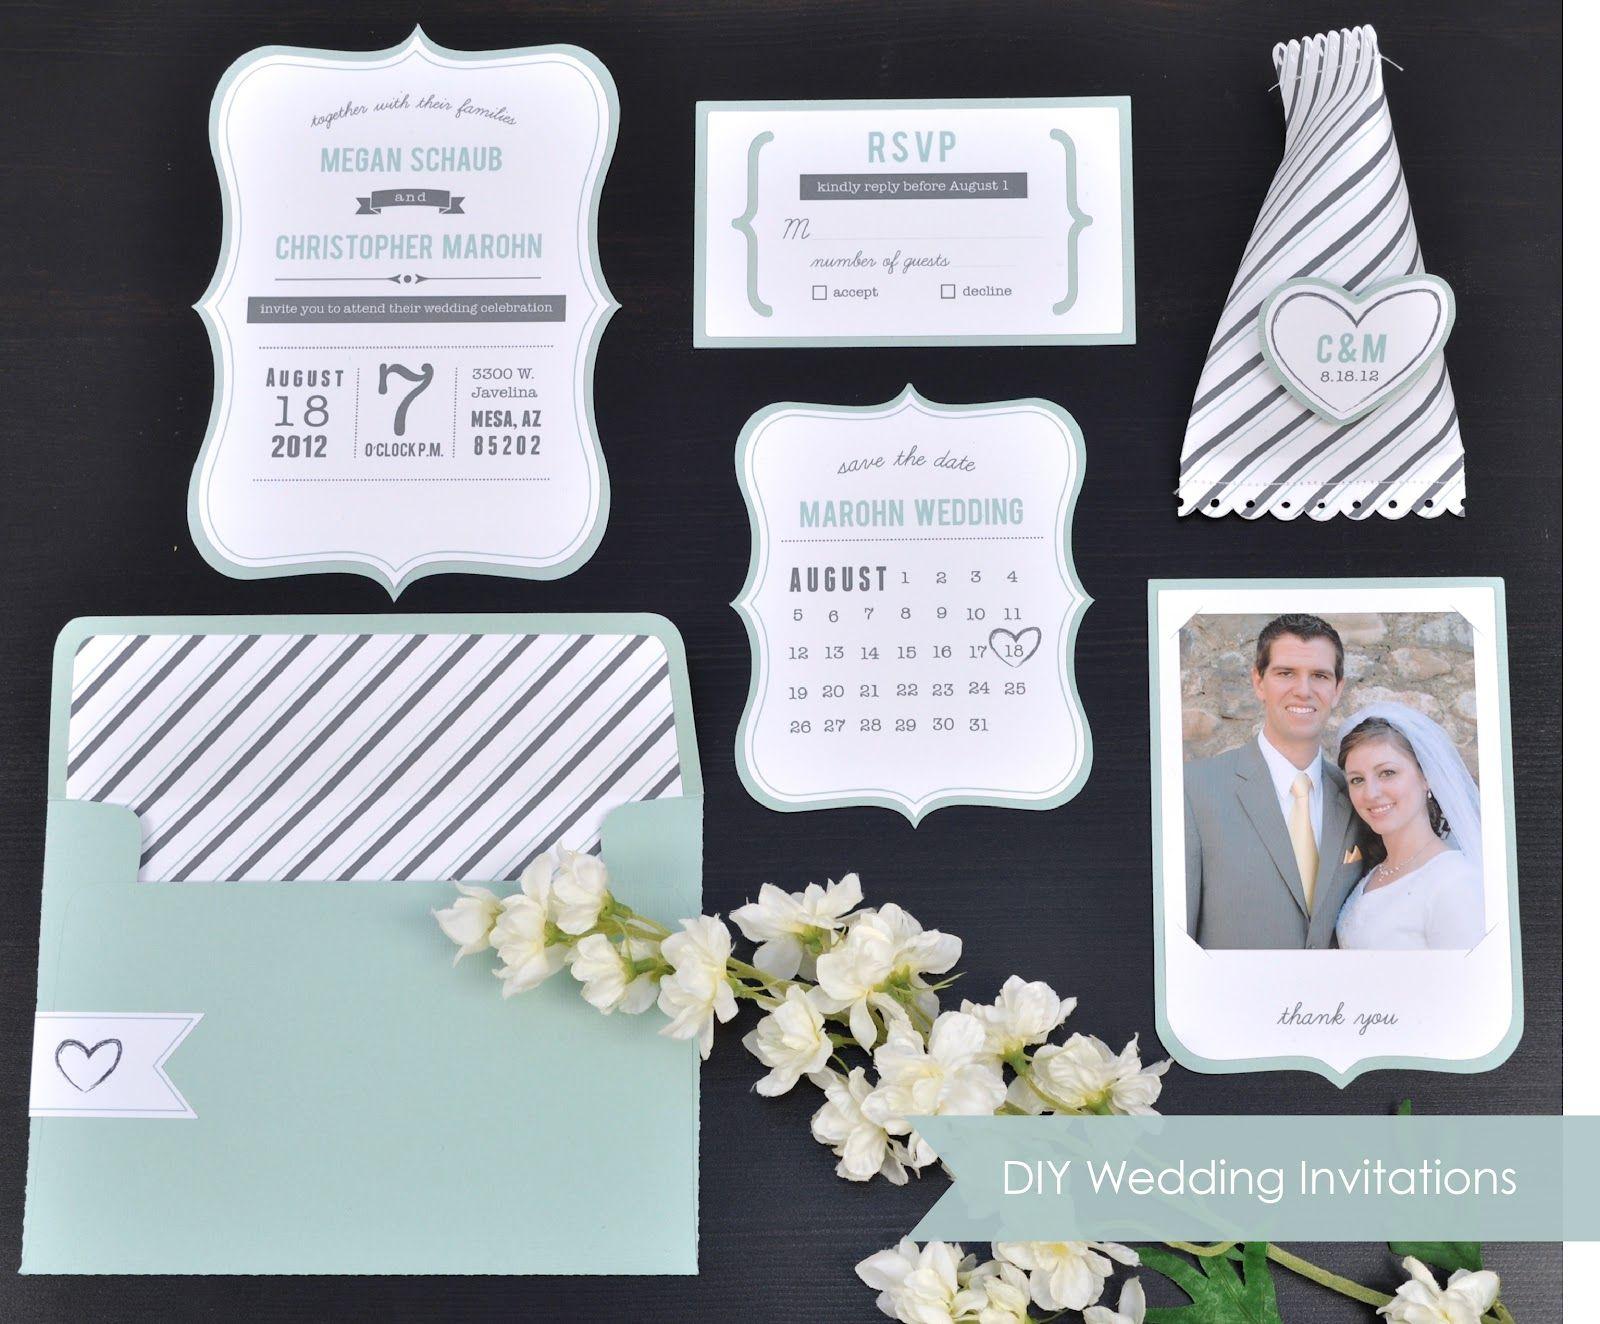 Top 10 DIY Wedding Projects   DIY wedding, Diy wedding invitations ...